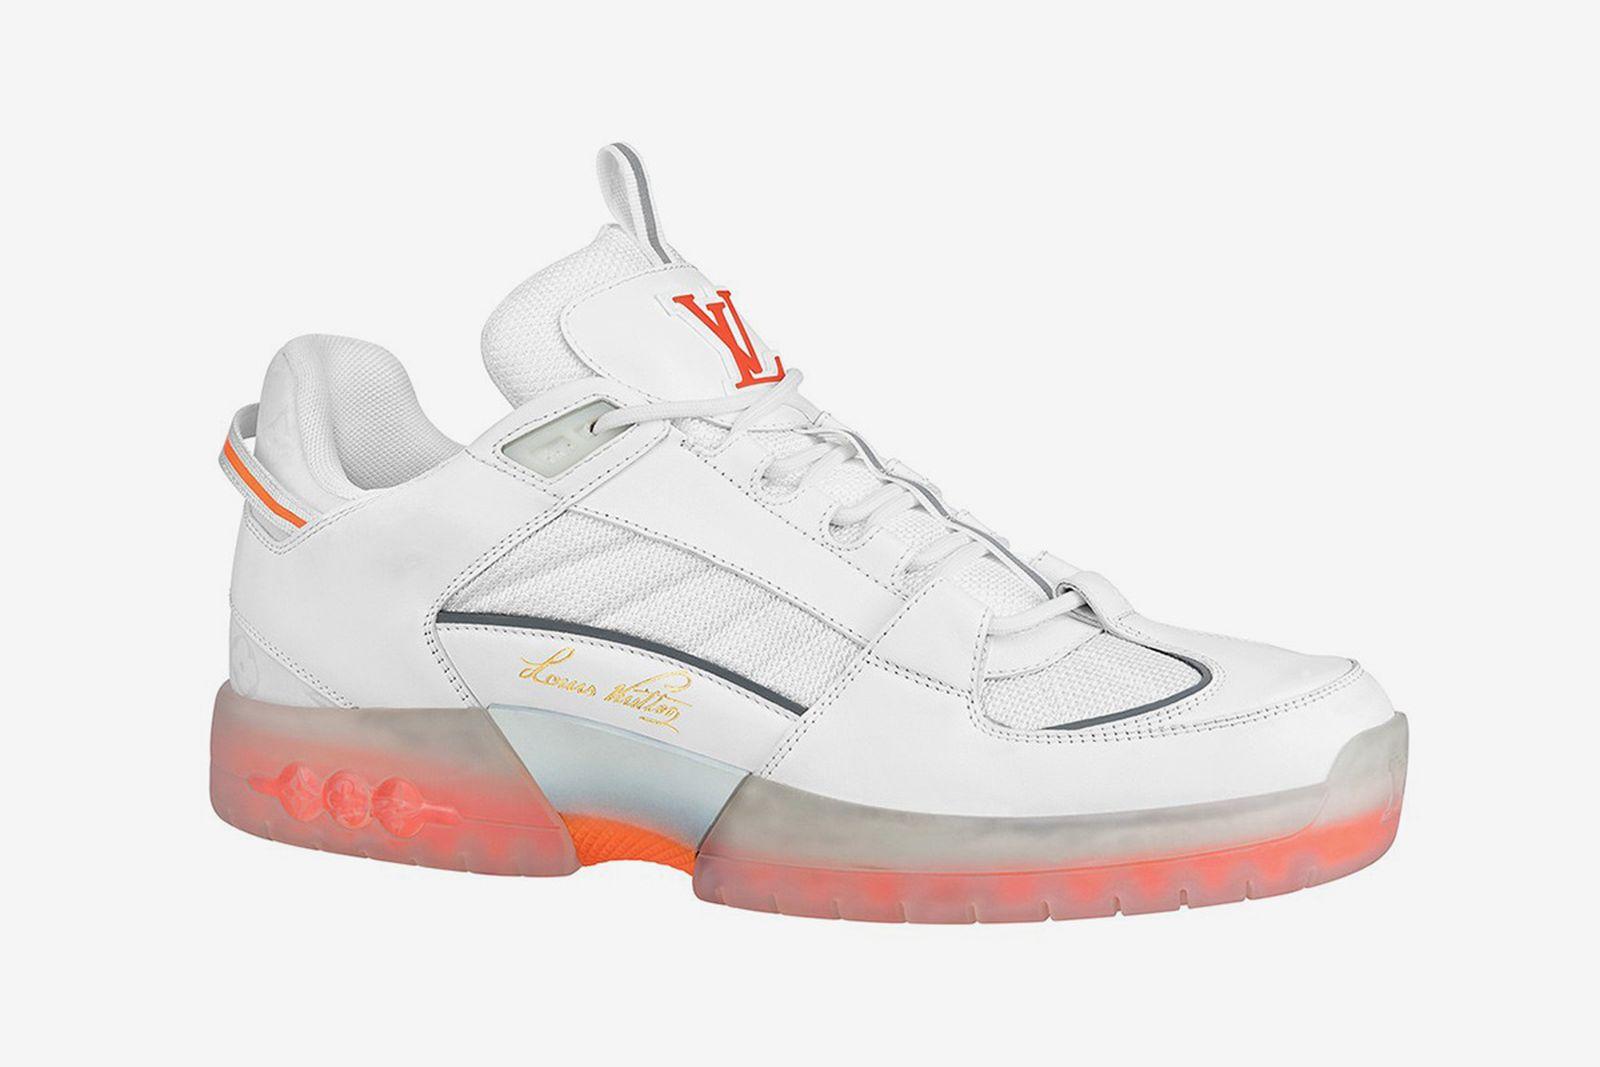 lucien-clarke-louis-vuitton-skate-shoe-release-date-price-03